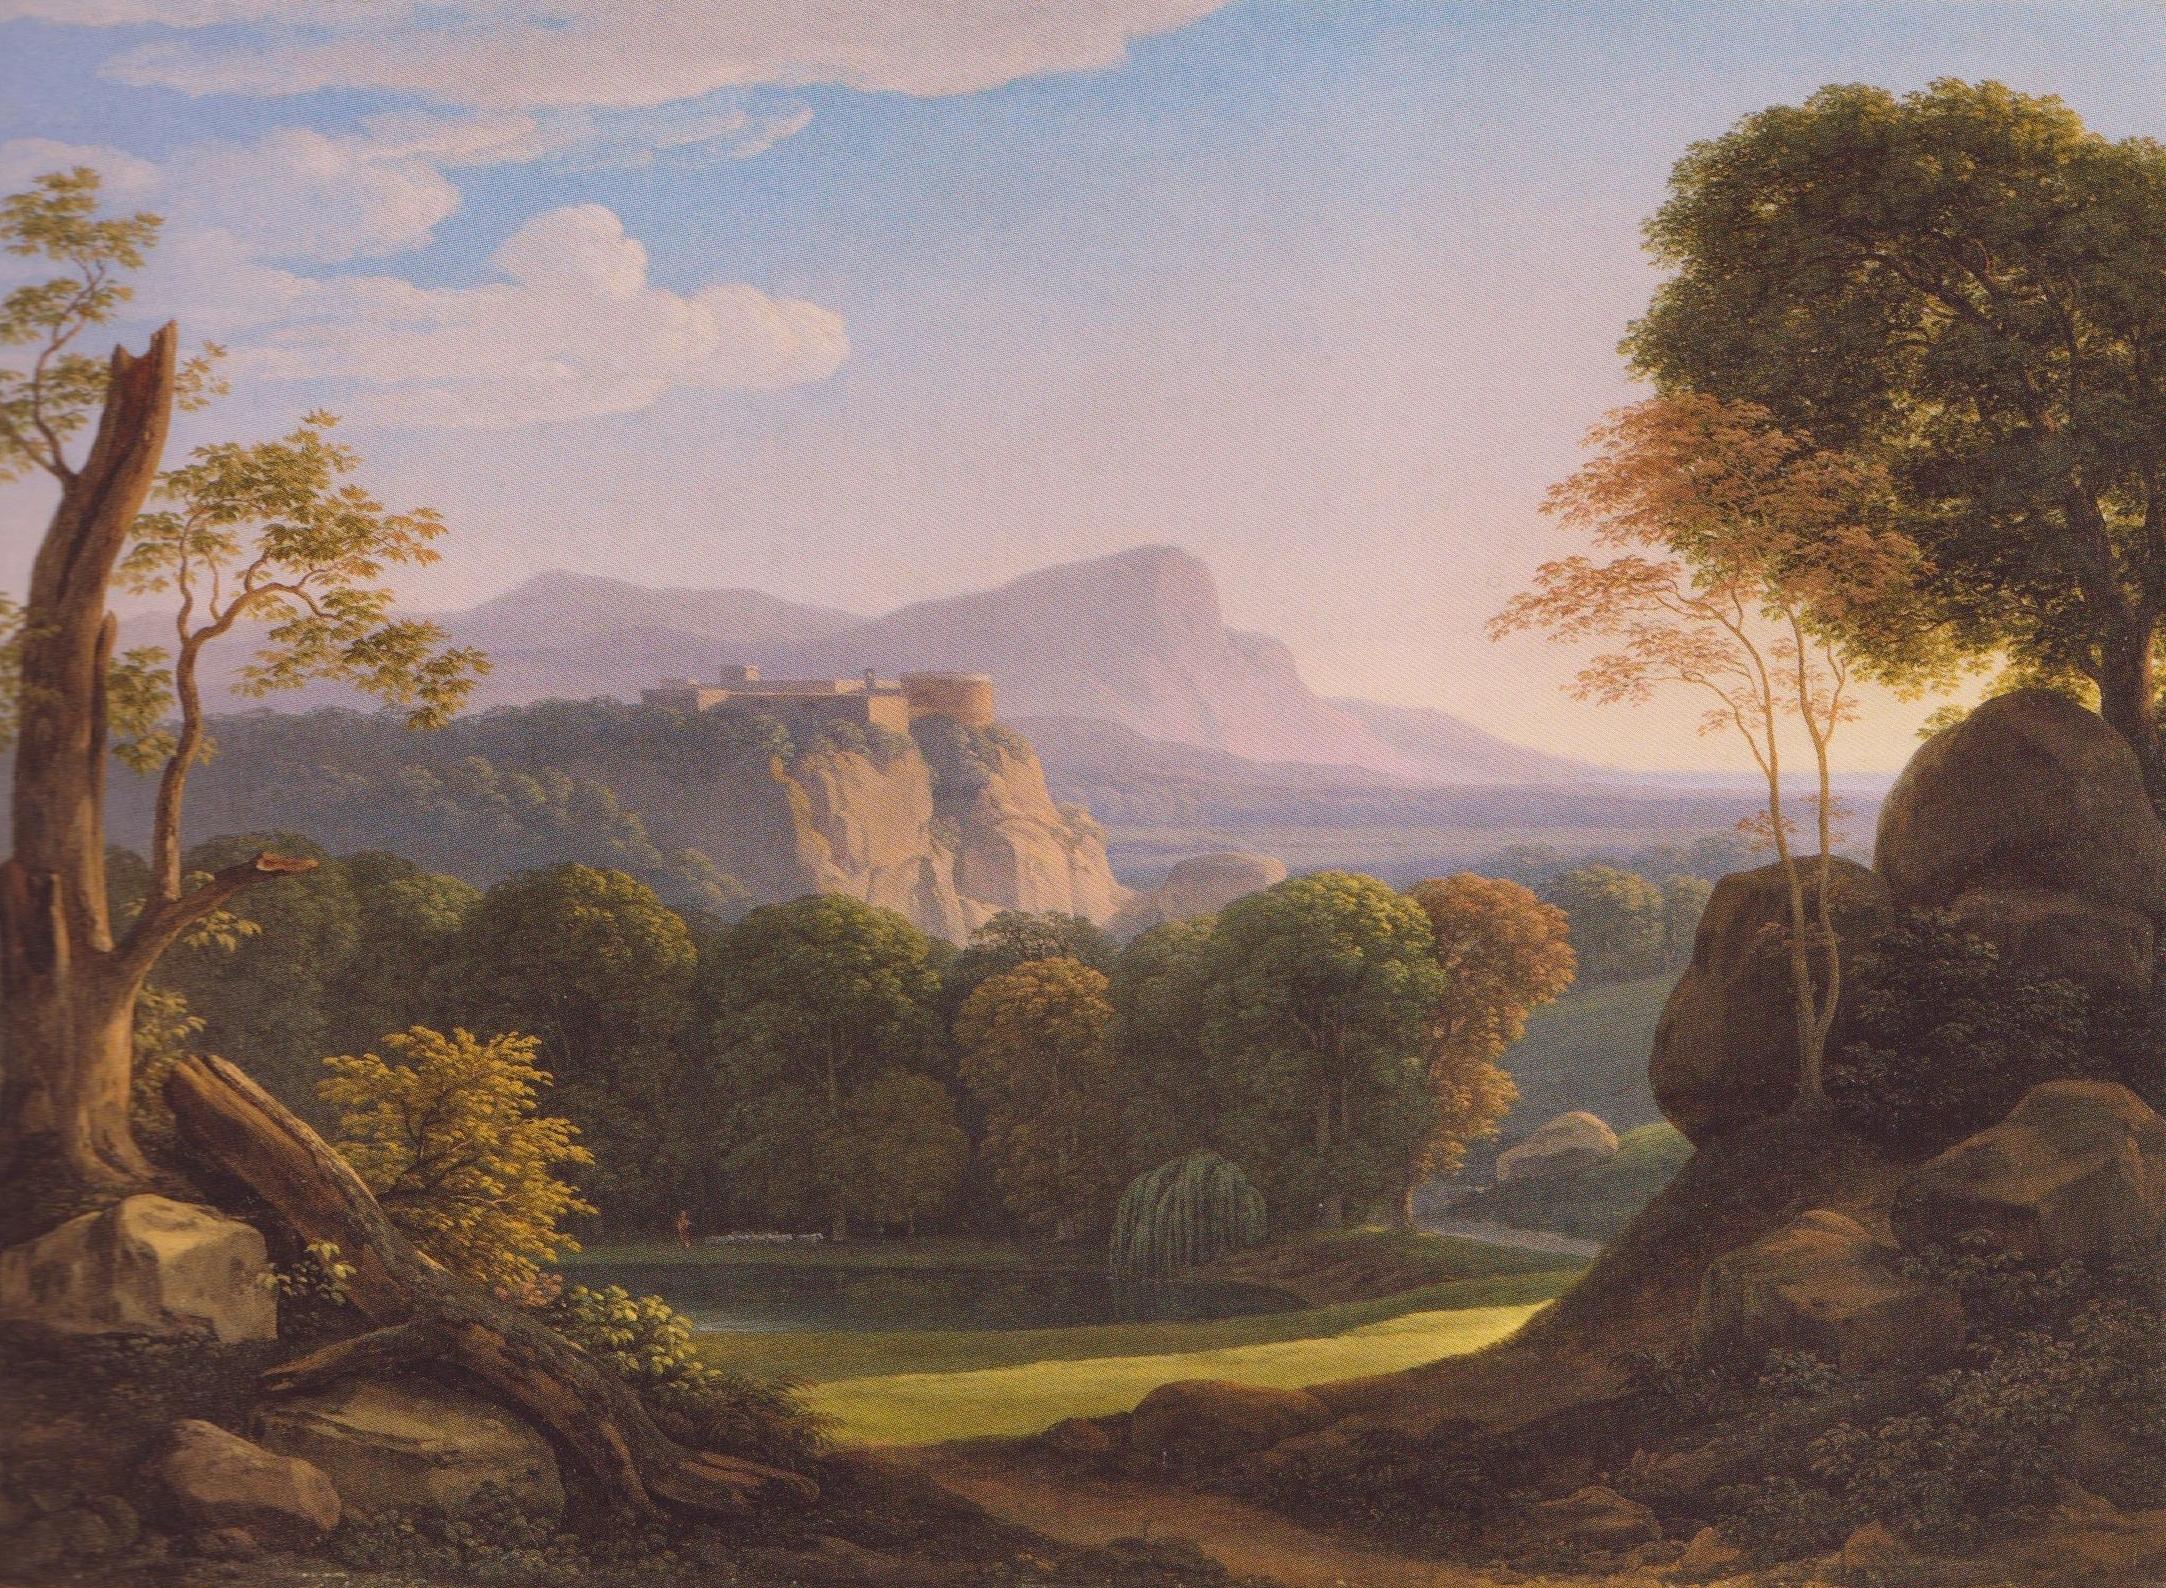 Landschaftsmalerei renaissance  Theorie der Landschaftsmalerei by Hannah Desczyk on Prezi